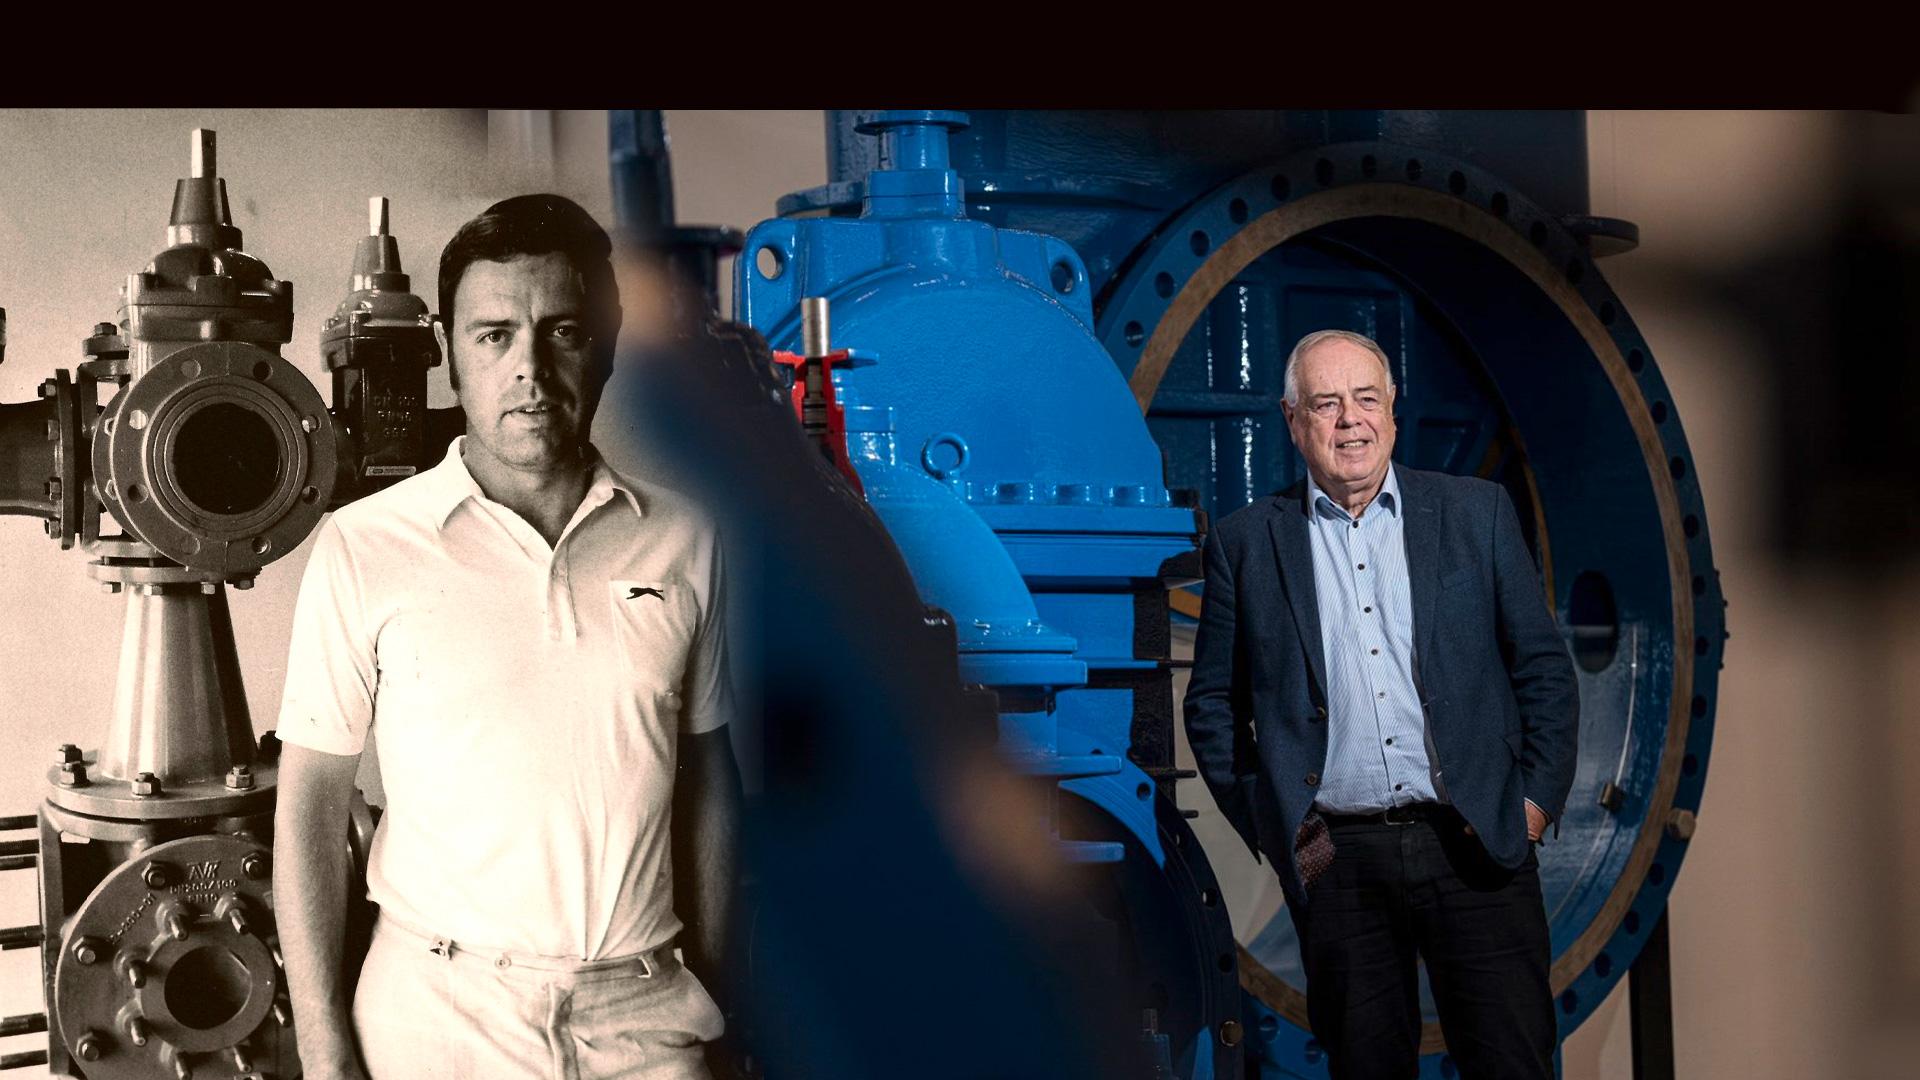 Niels Aage Kjær celebrates 50th work anniversary